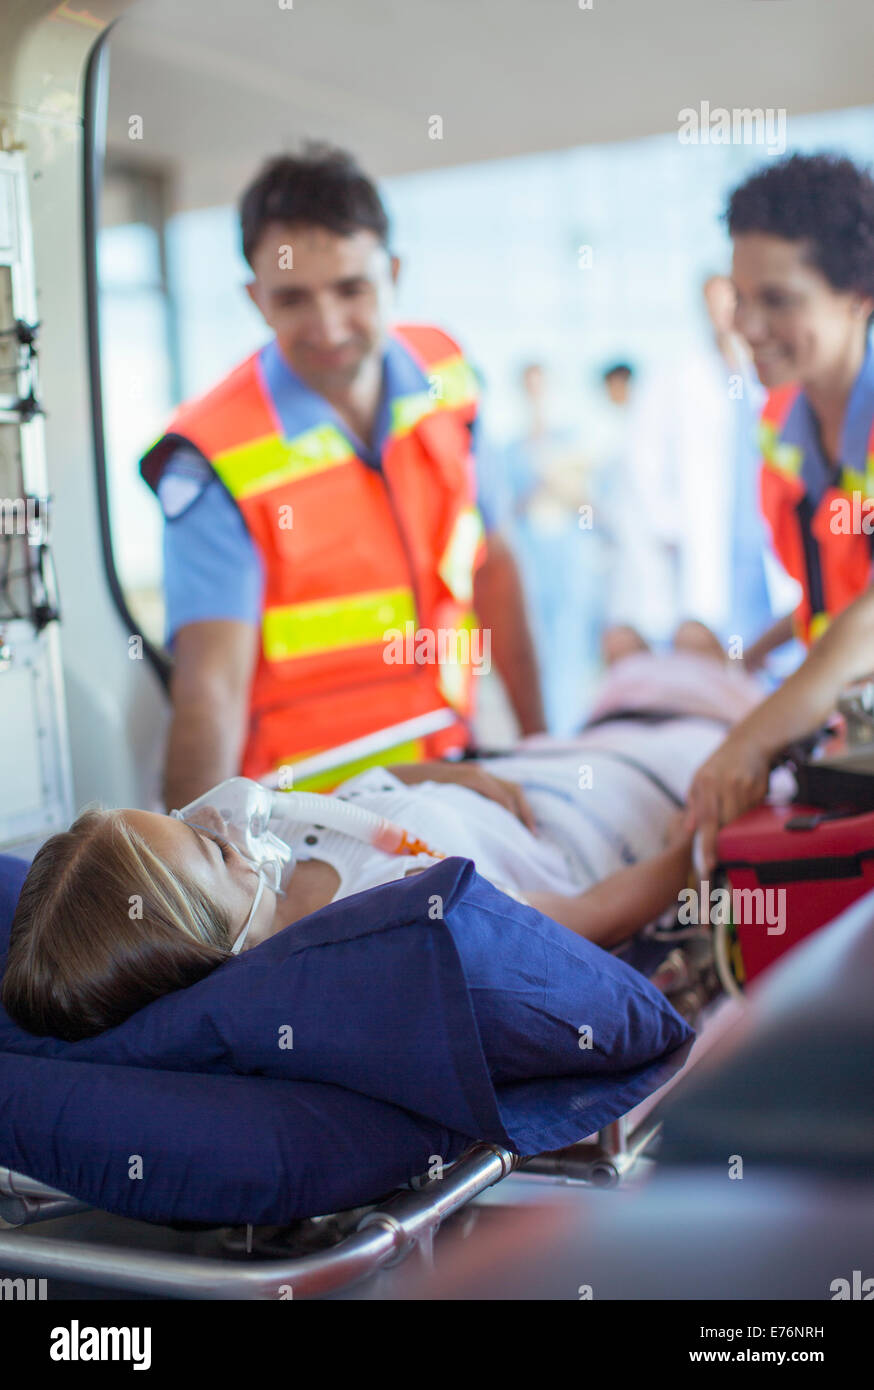 Paramedics examining patient on ambulance stretcher - Stock Image